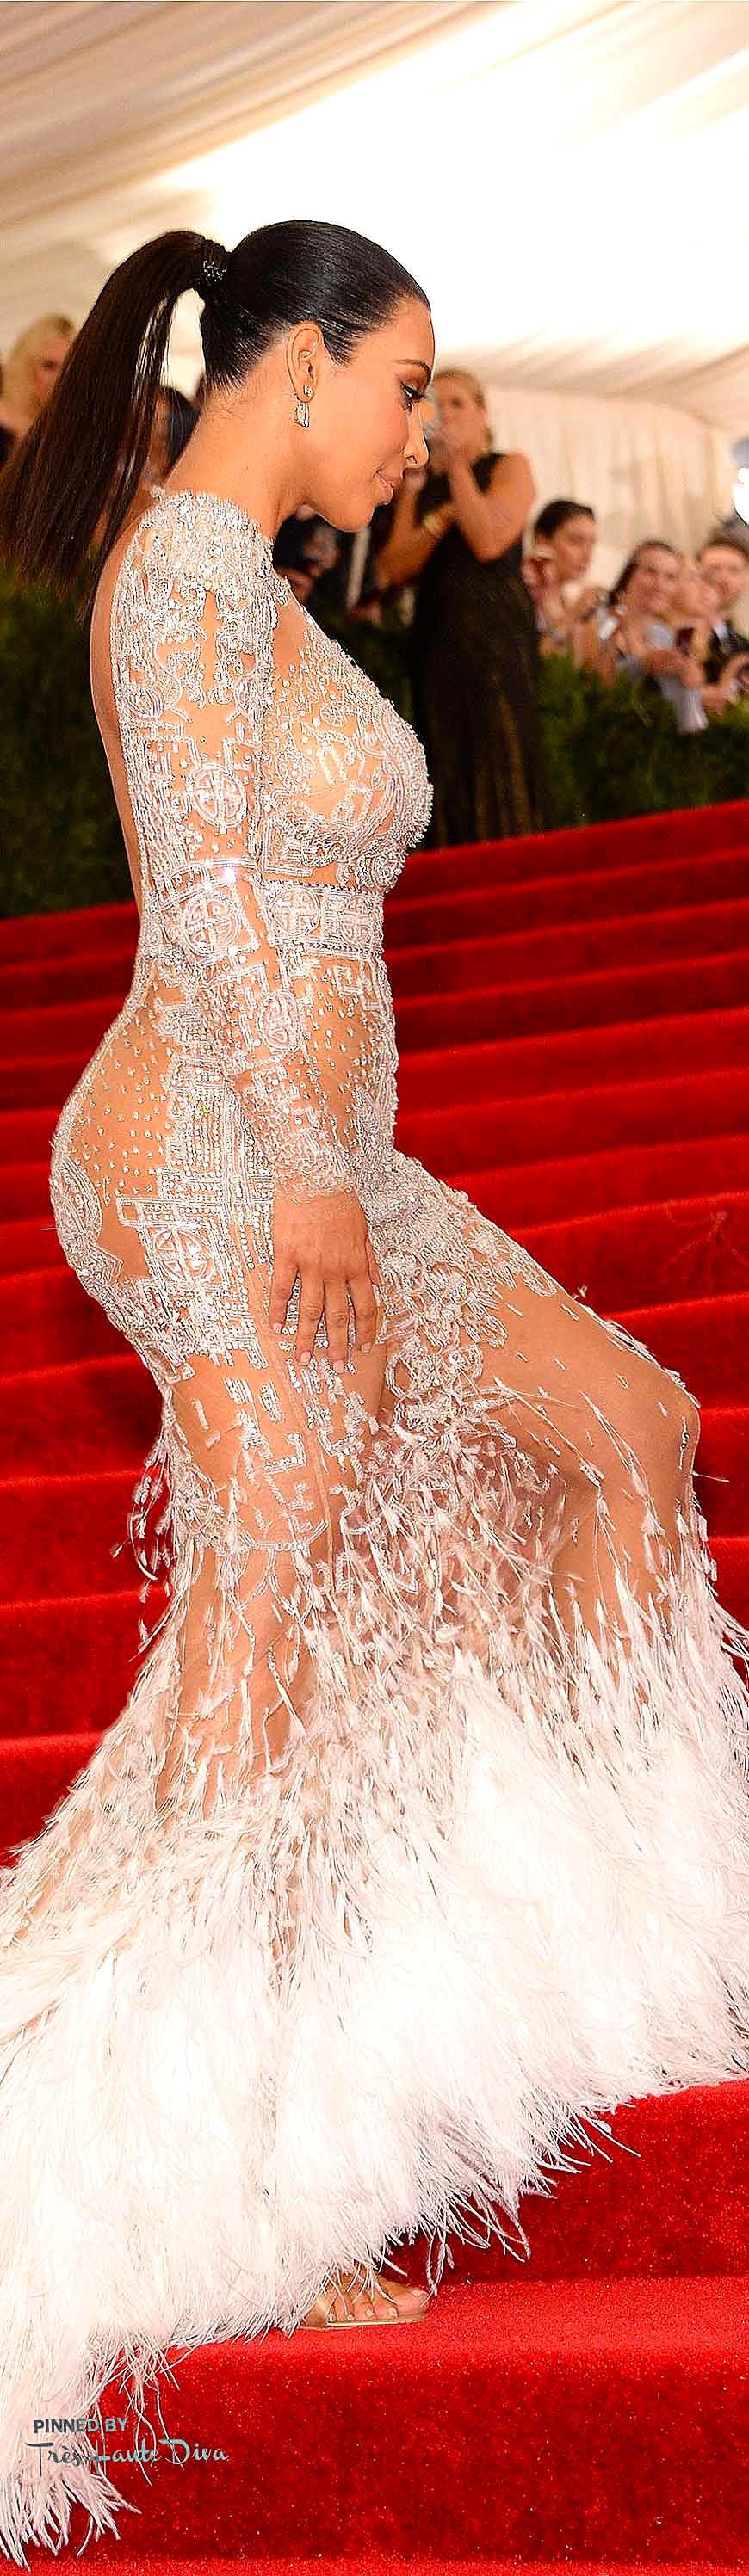 Kim Kardashian in Roberto Cavalli Getty Images/ Kevin Mazur